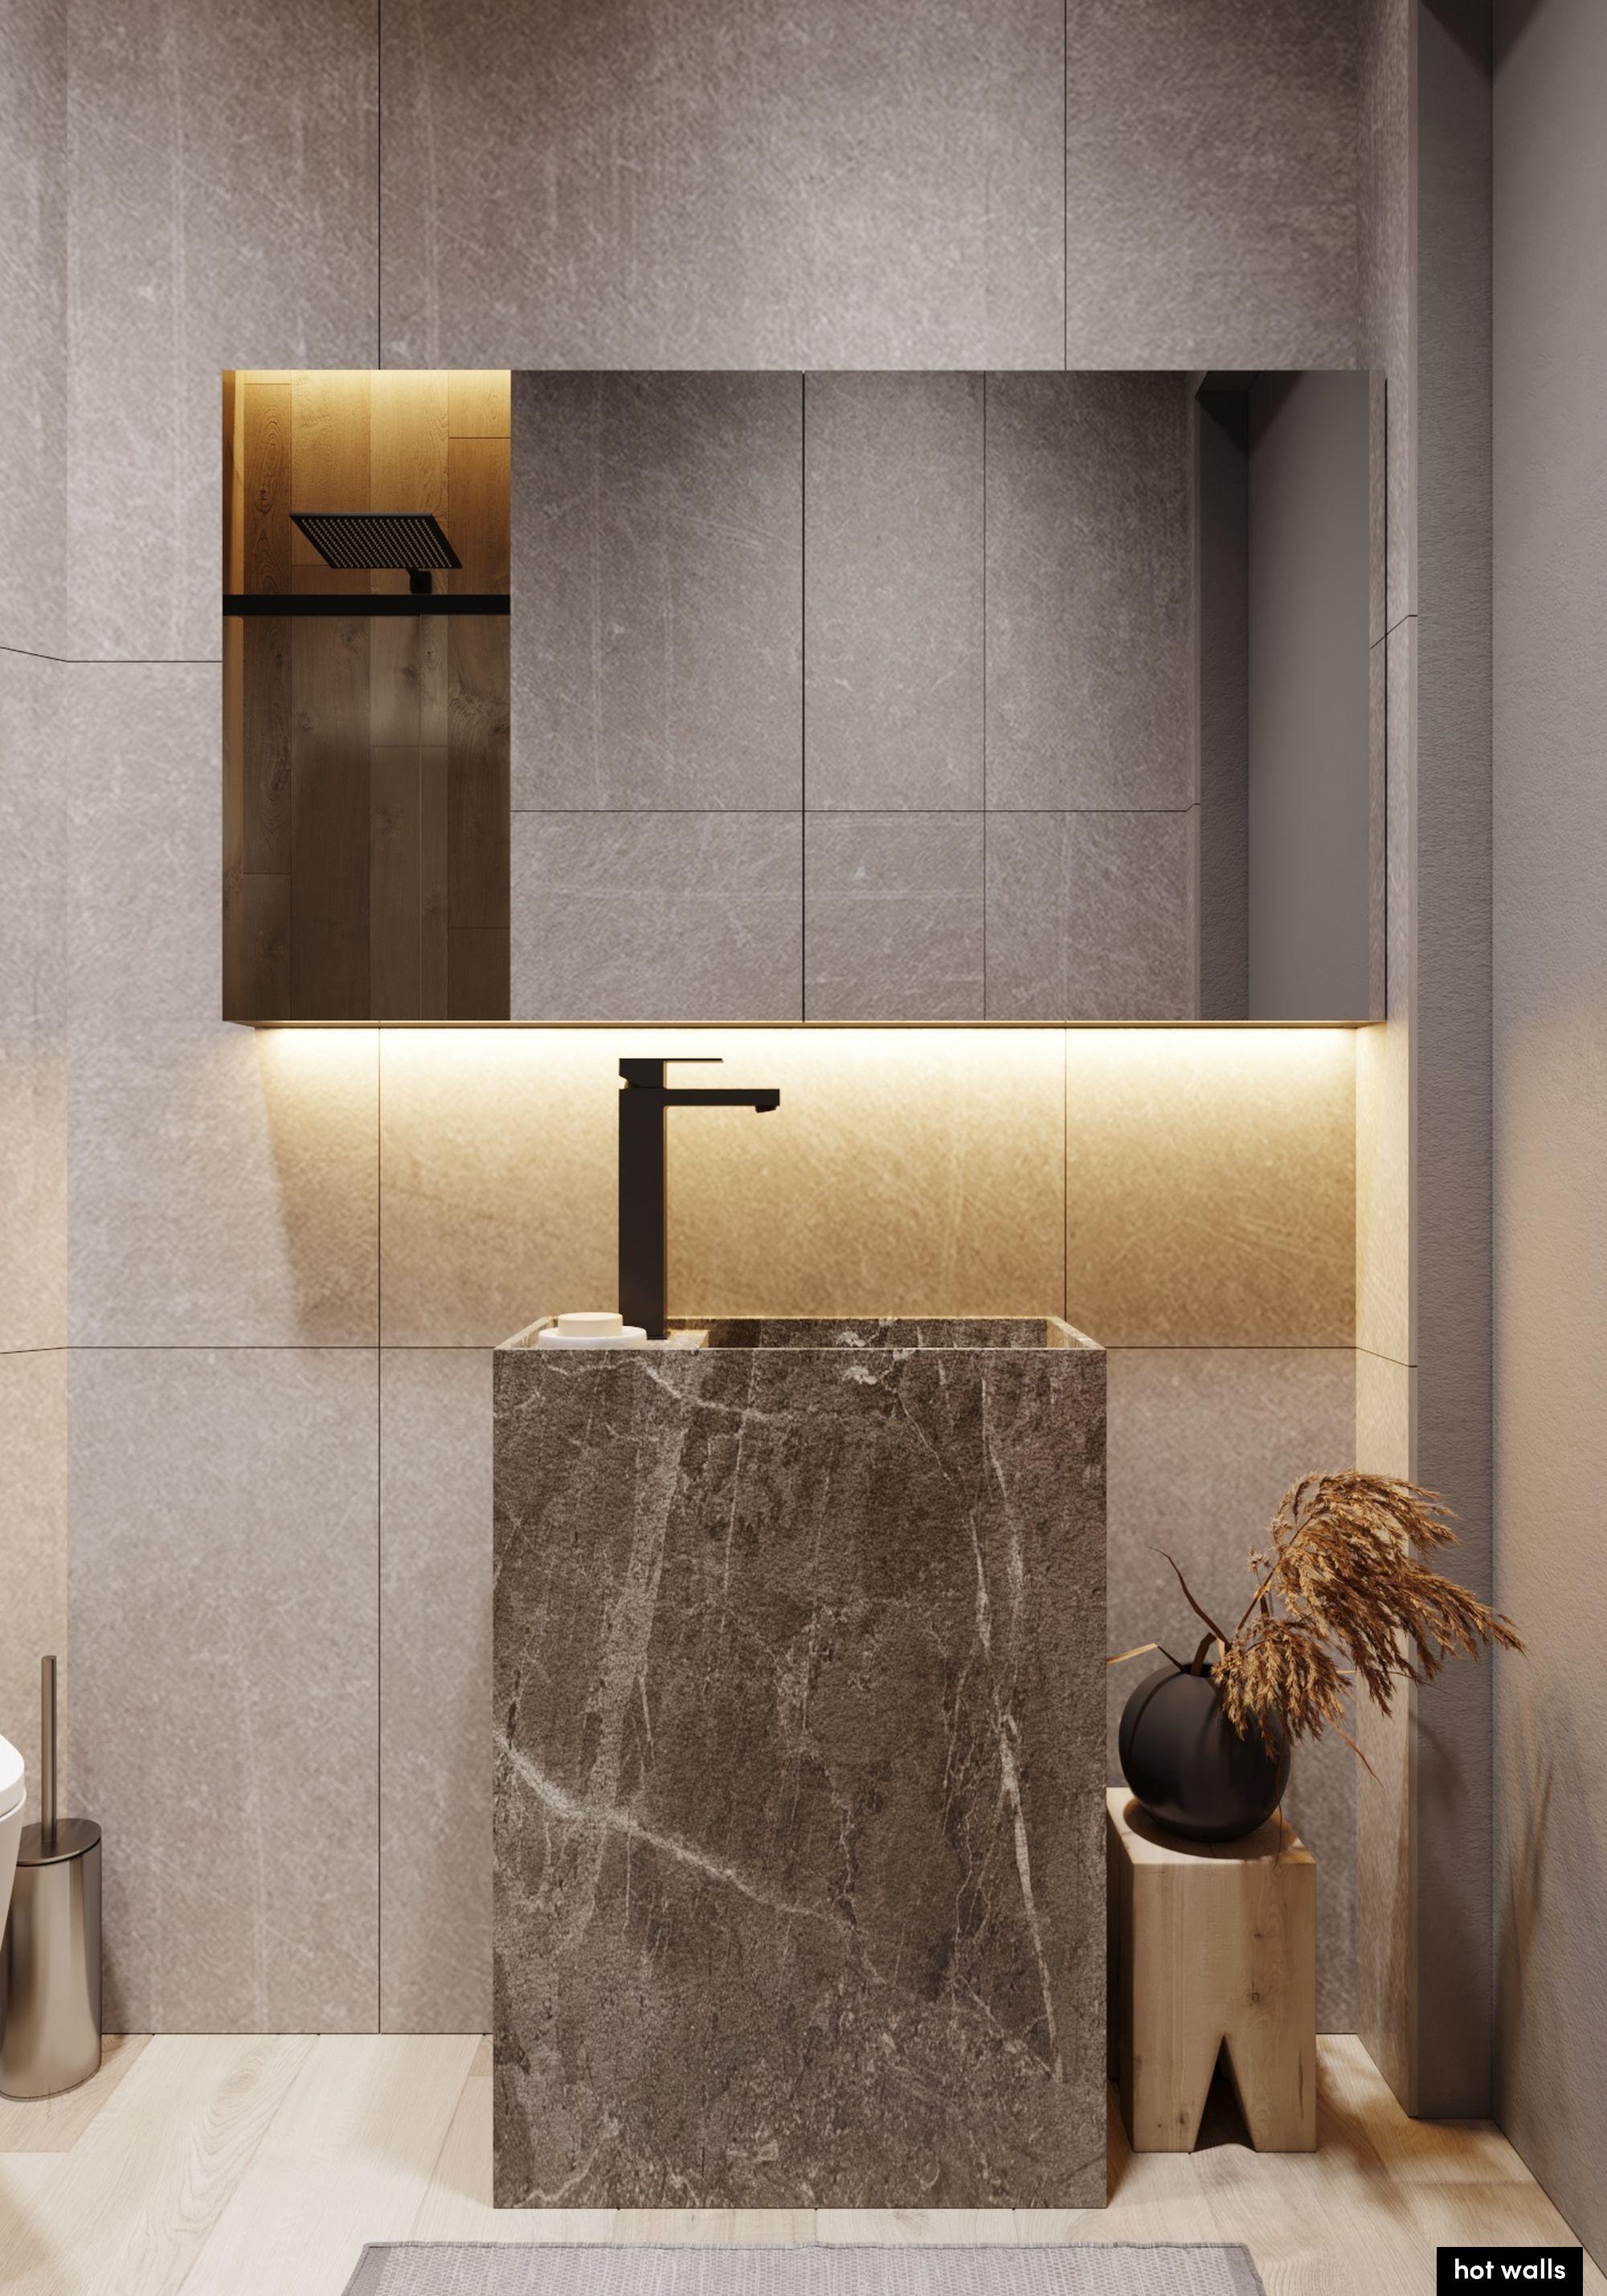 SECOND BATHROOM 1